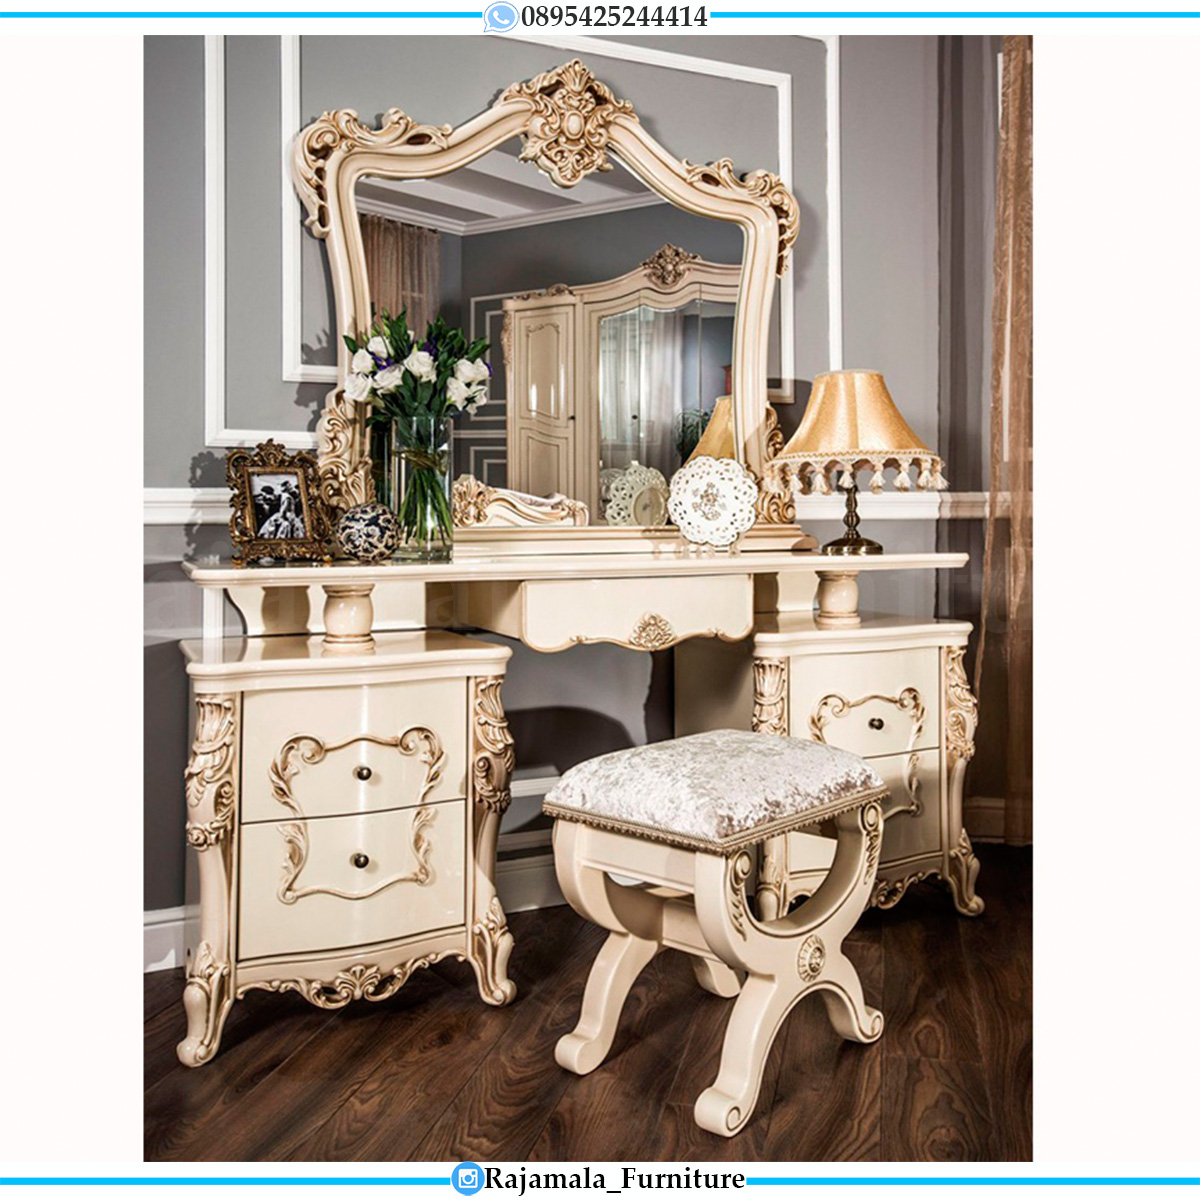 Meja Rias Mewah Terbaru New Luxury Classic Style White Duco Glossy RM-0552